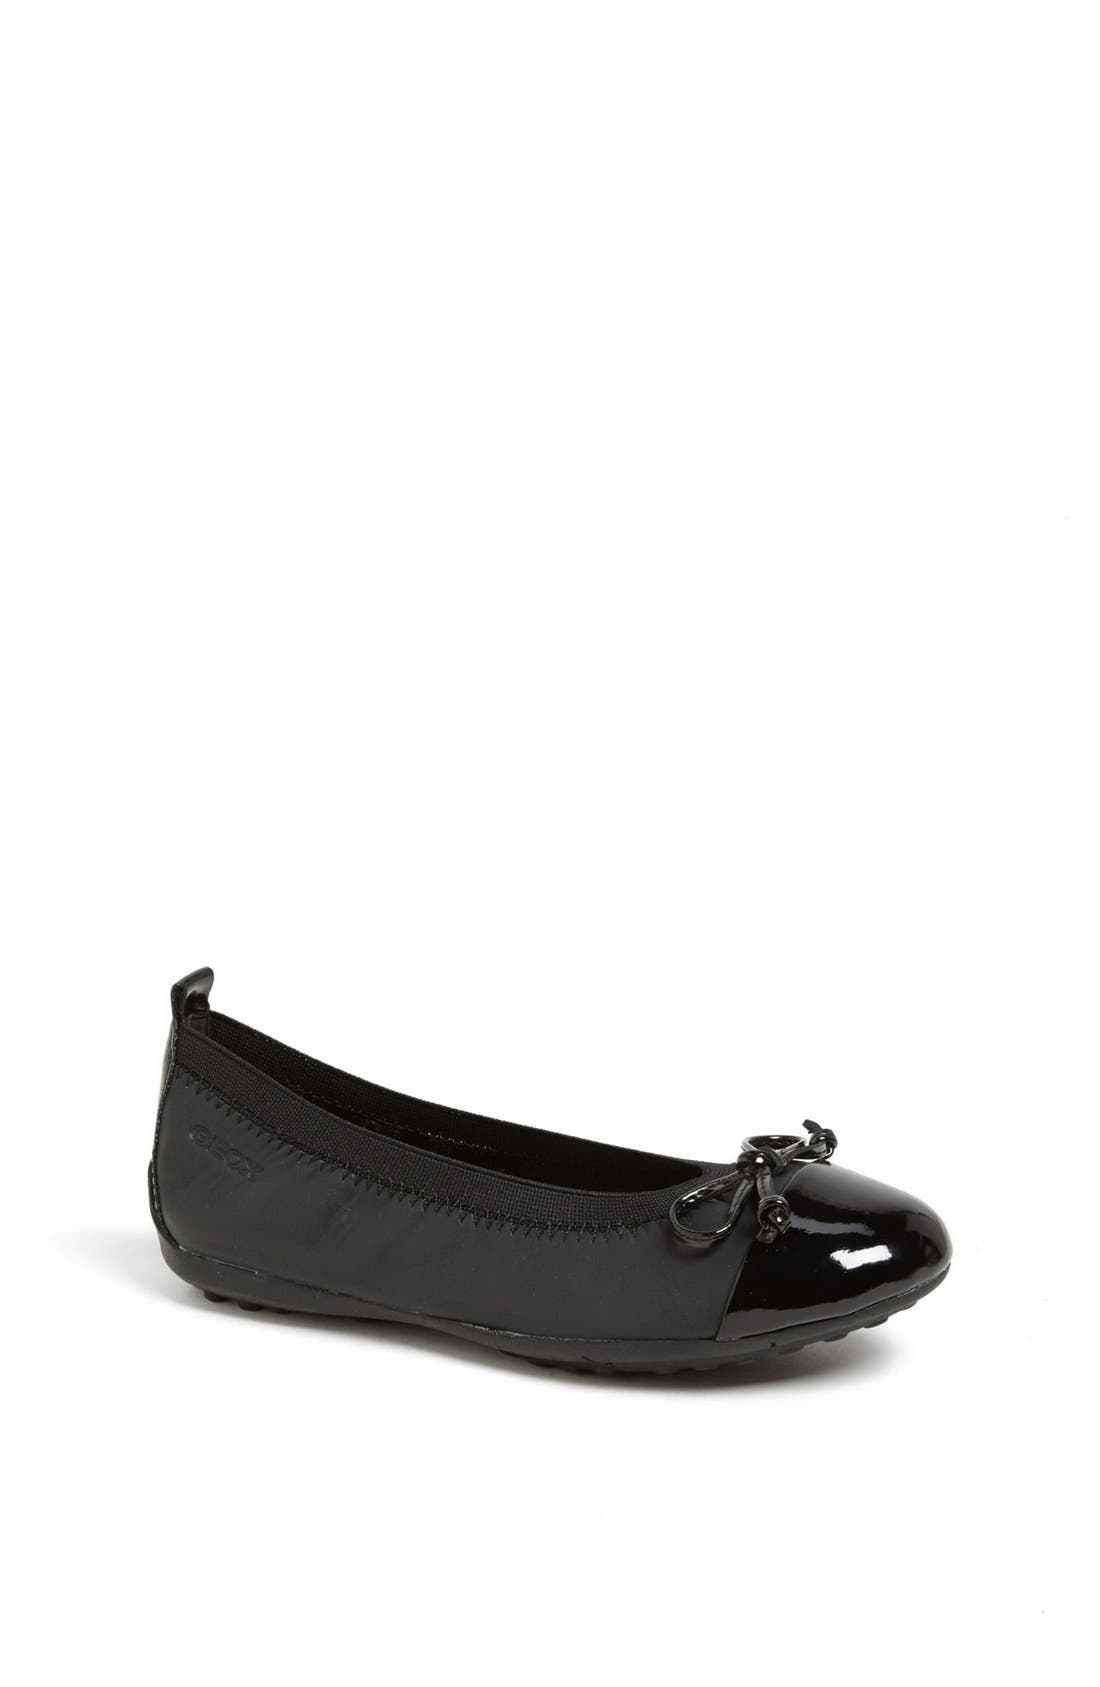 'Piuma' Ballerina Flat,                         Main,                         color, Black